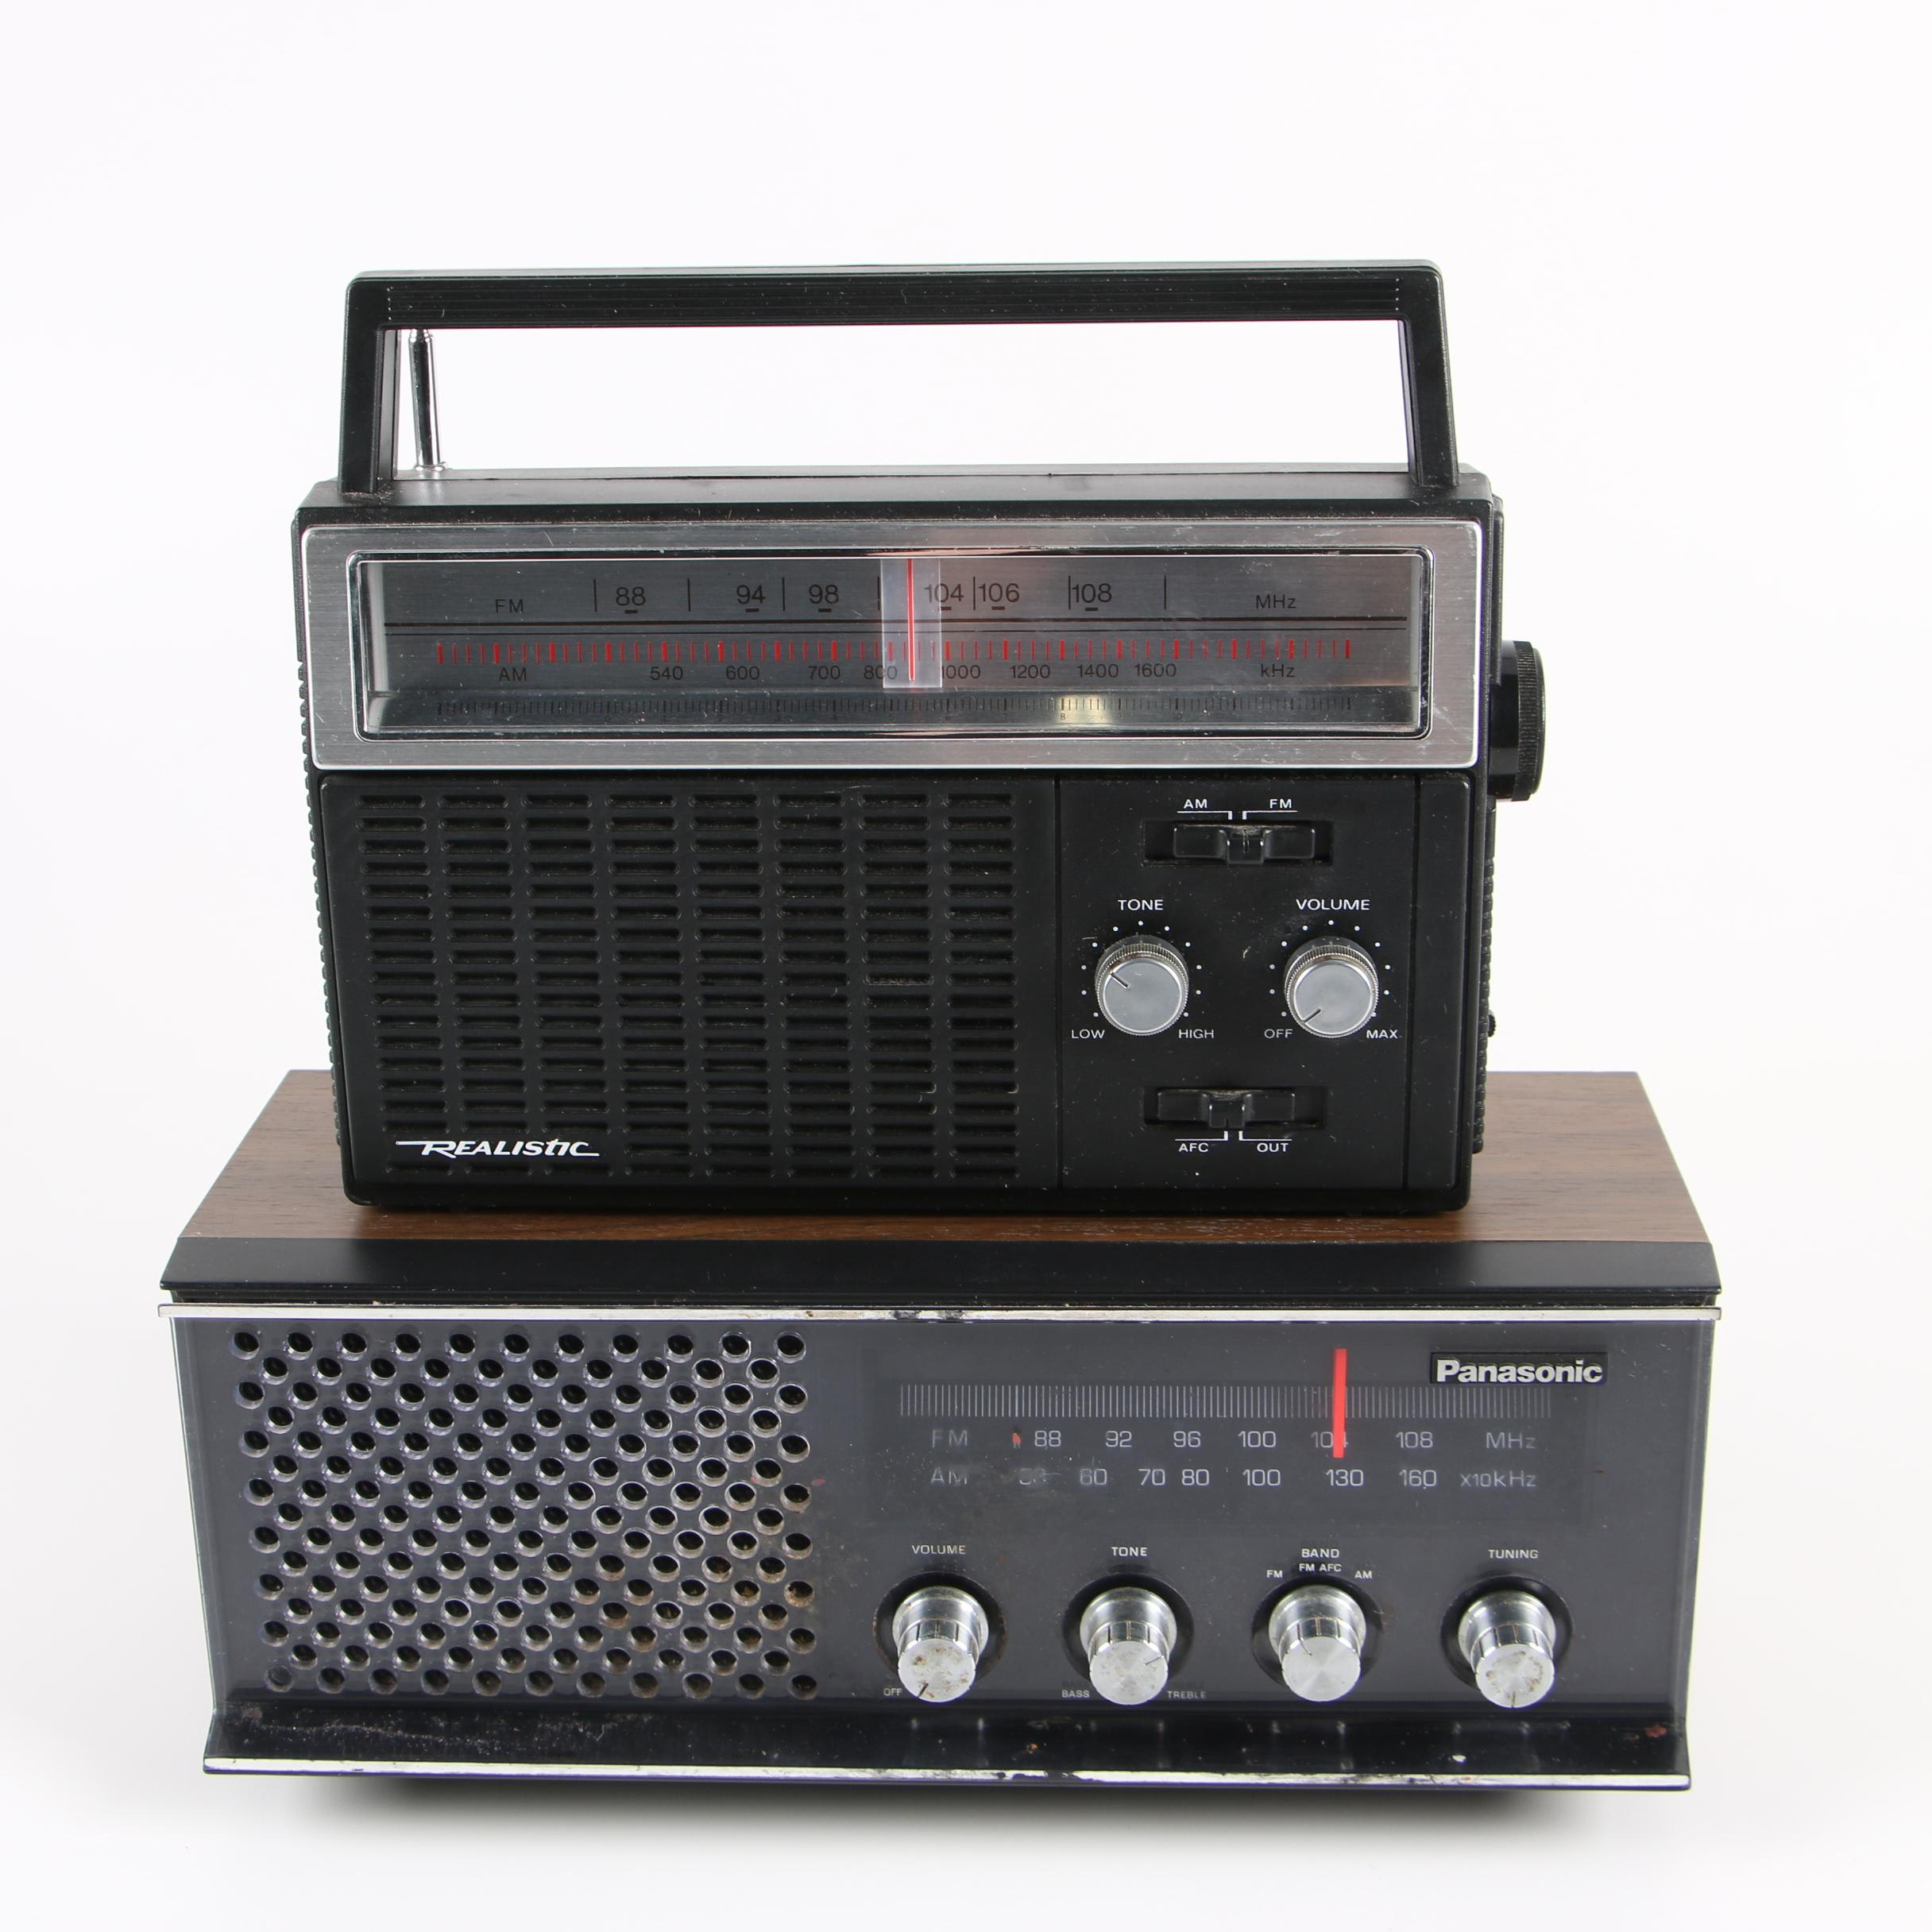 Realistic and Panasonic Radios, c. 1970s